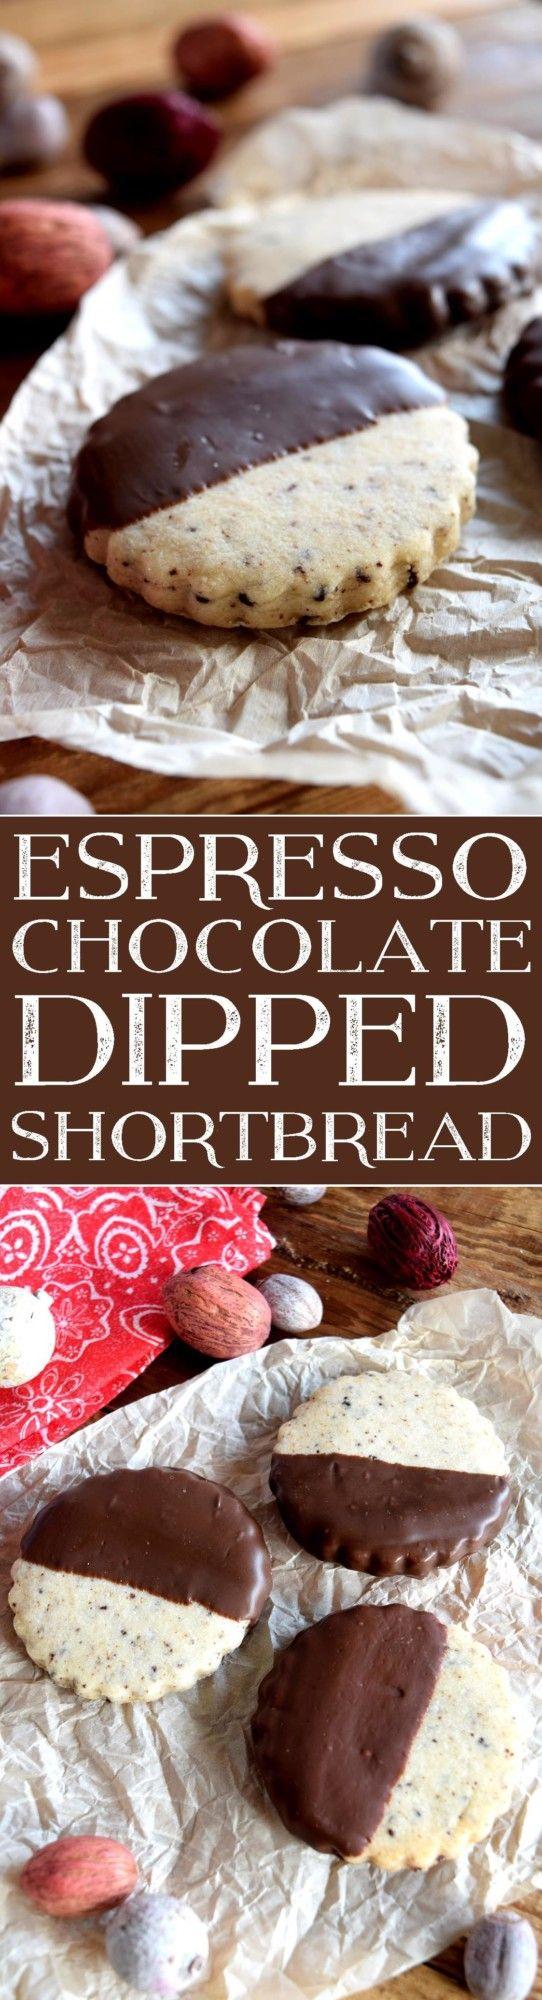 Espresso Chocolate Dipped Shortbread